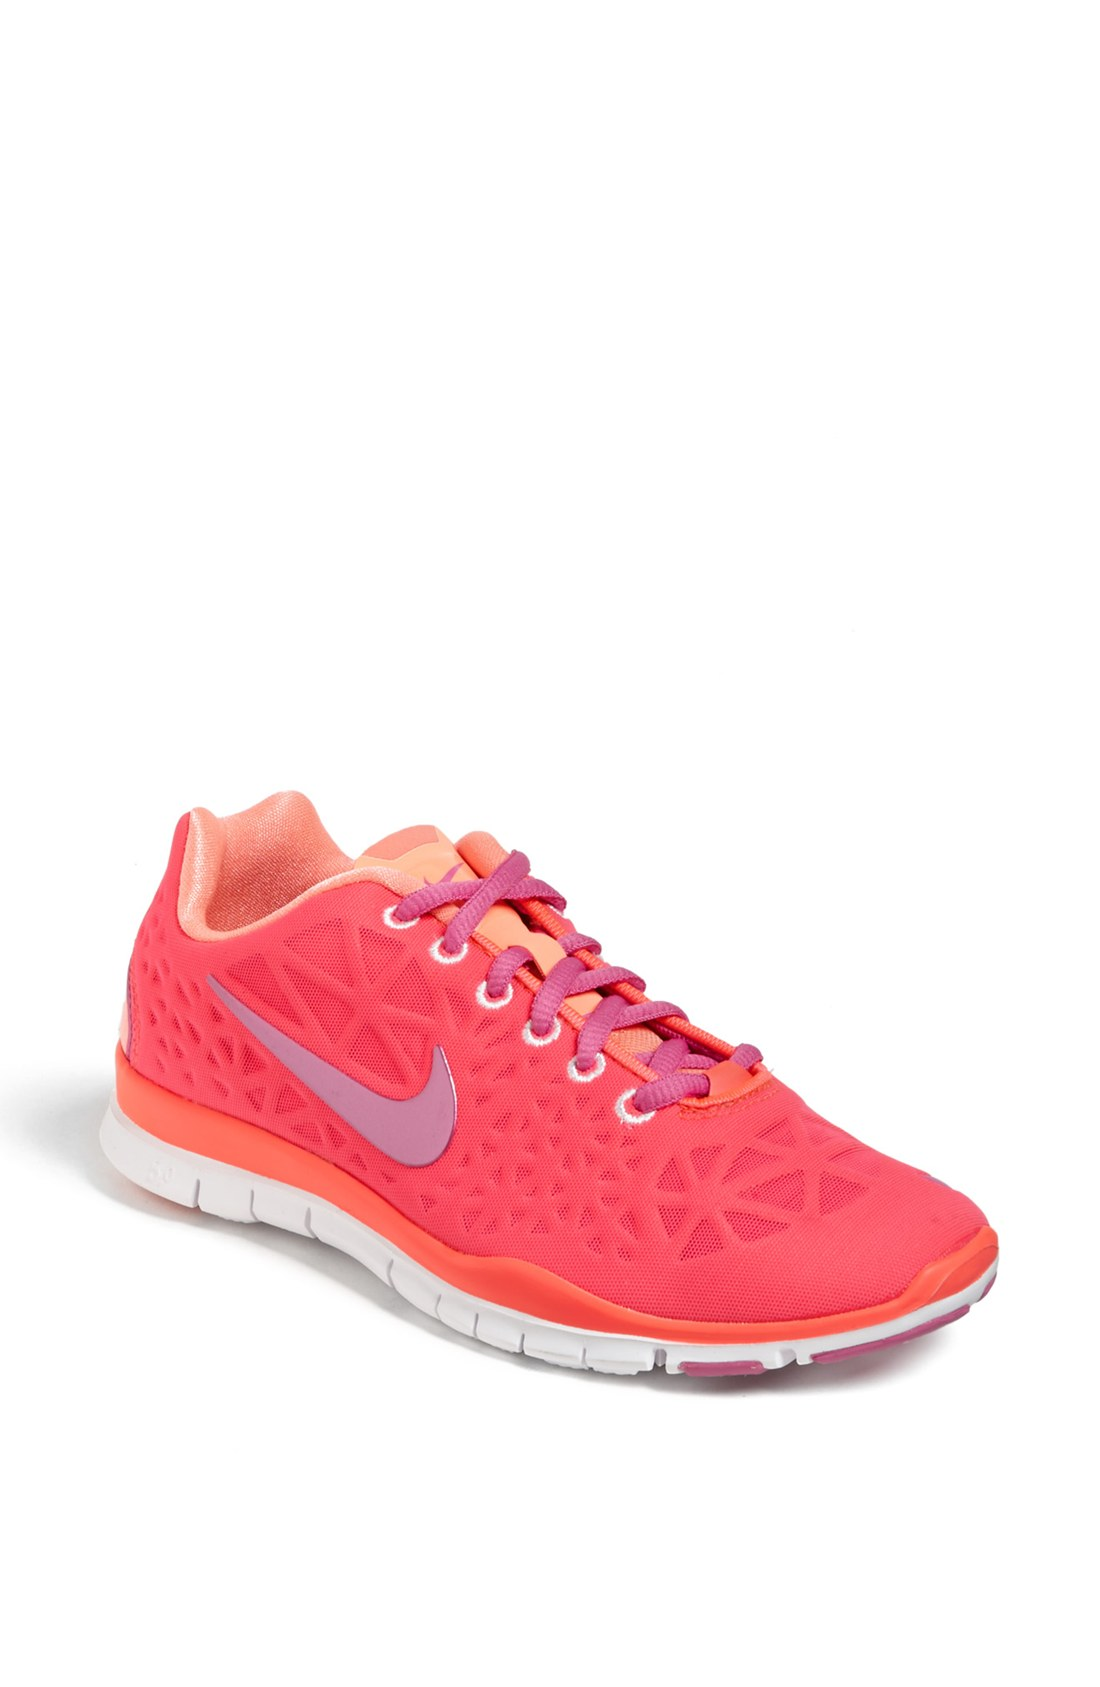 big sale e1c04 2d1ca nike free tr womens red pink